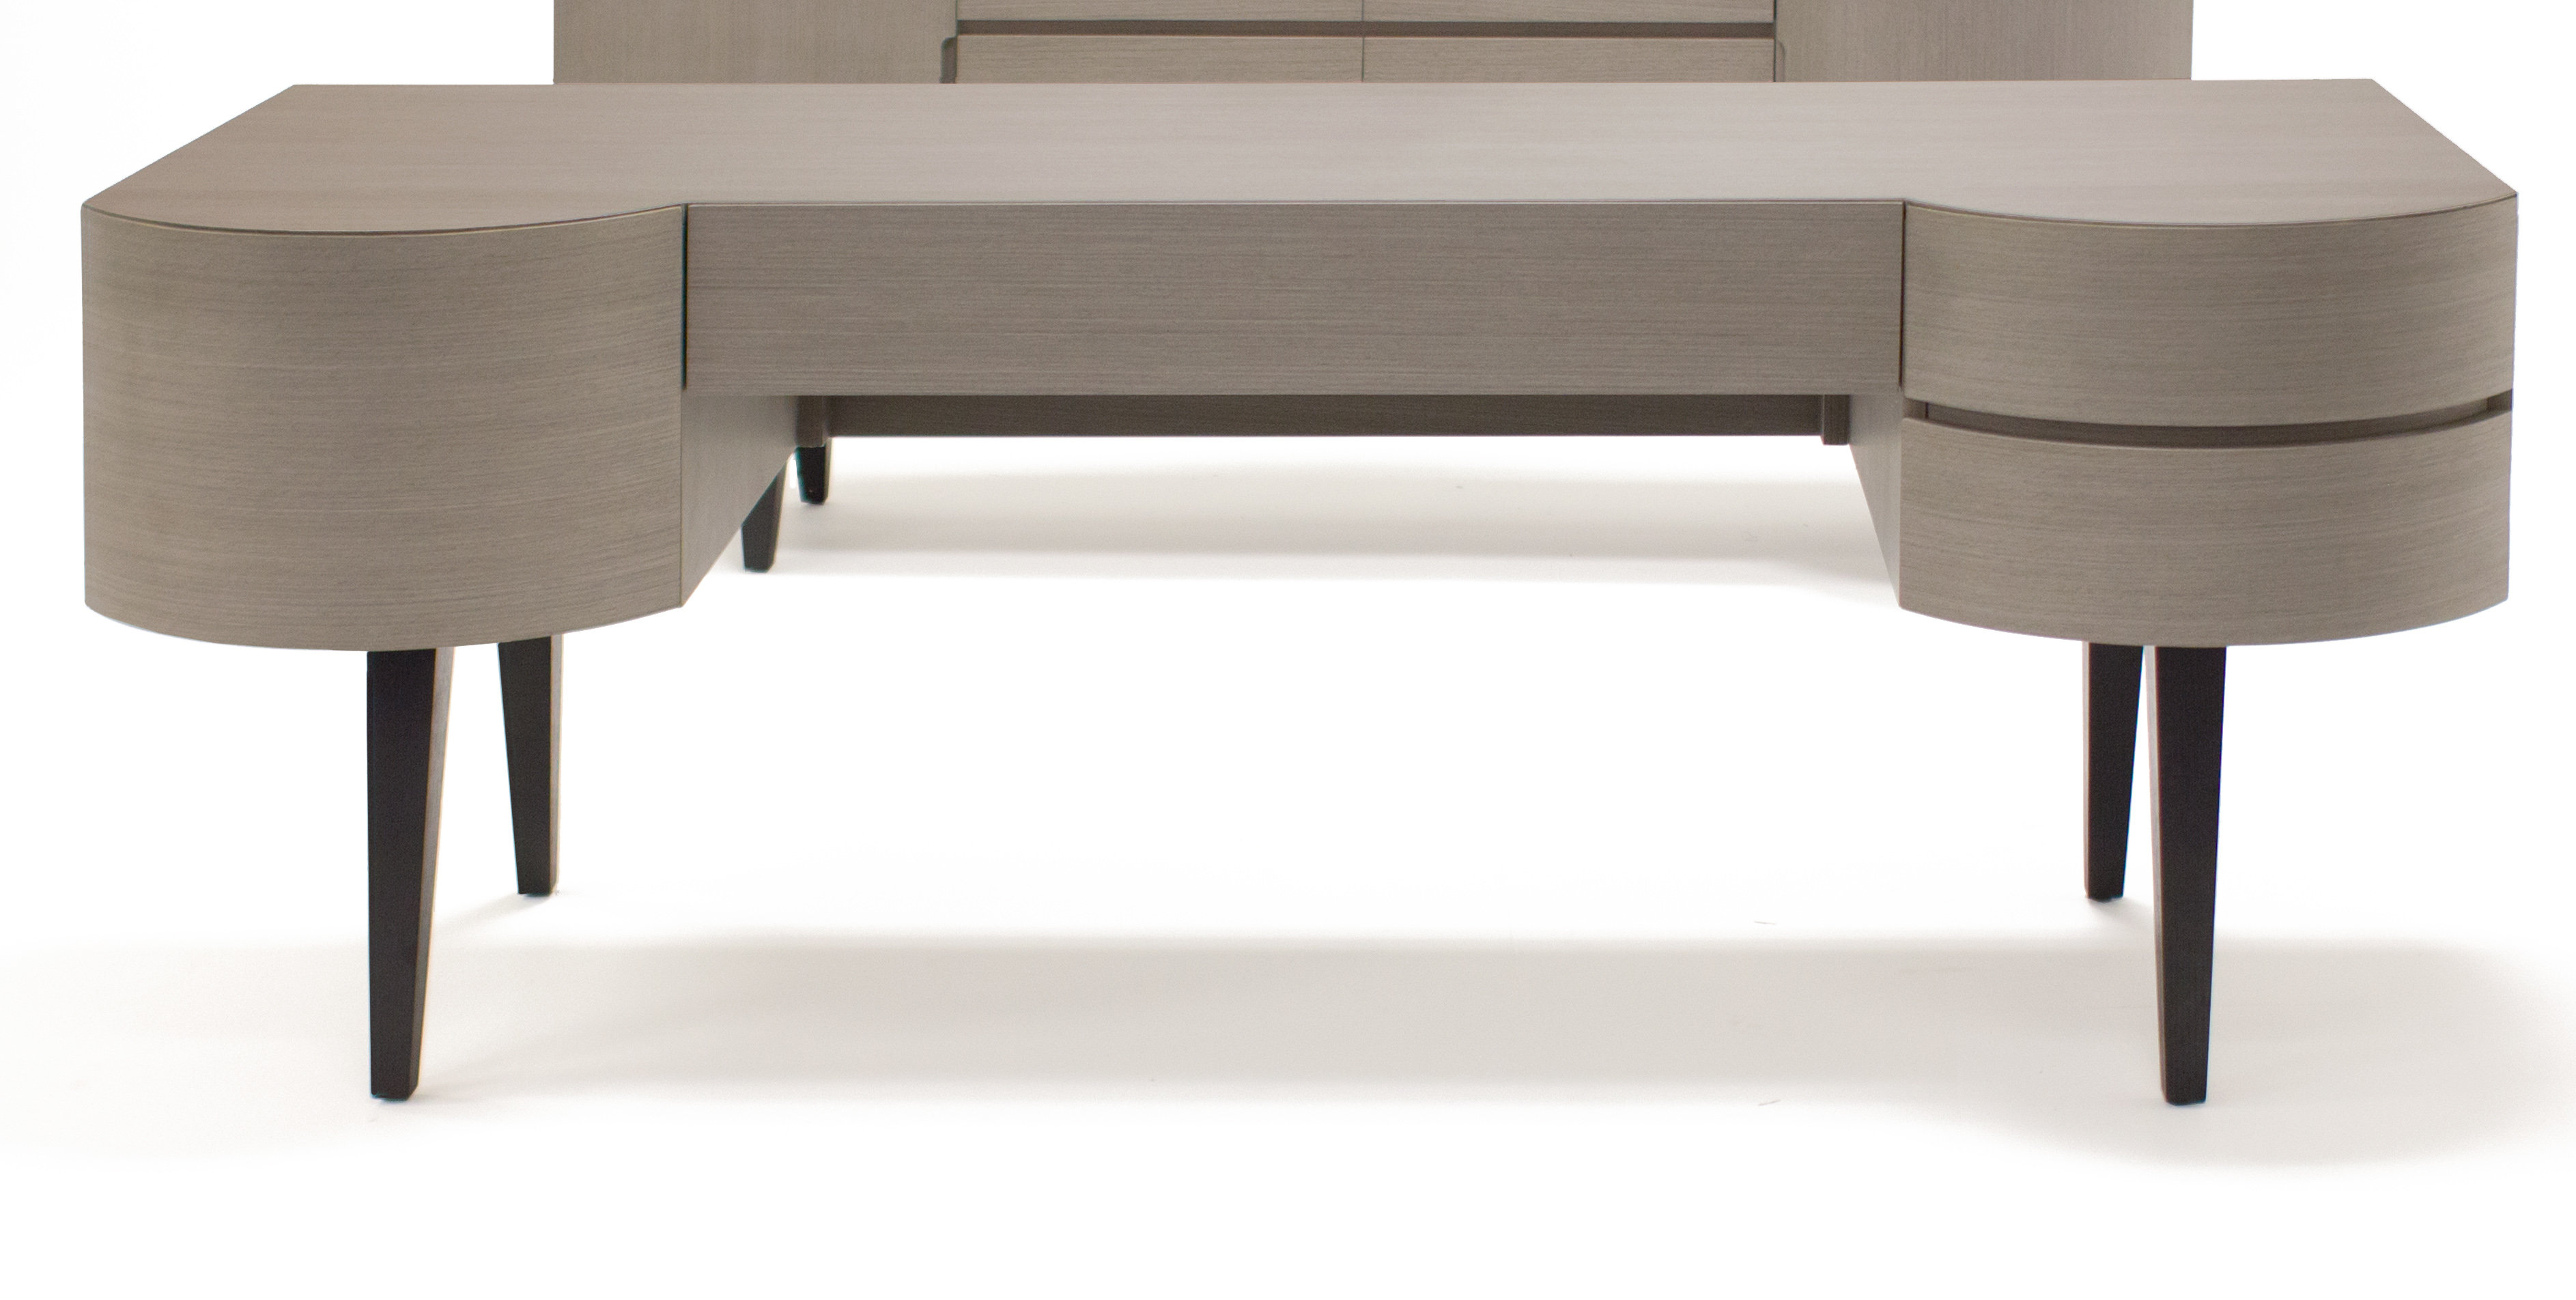 Brayden Studio Yukon U-Shape Computer Desk | Wayfair within Yukon Grey Console Tables (Image 7 of 30)